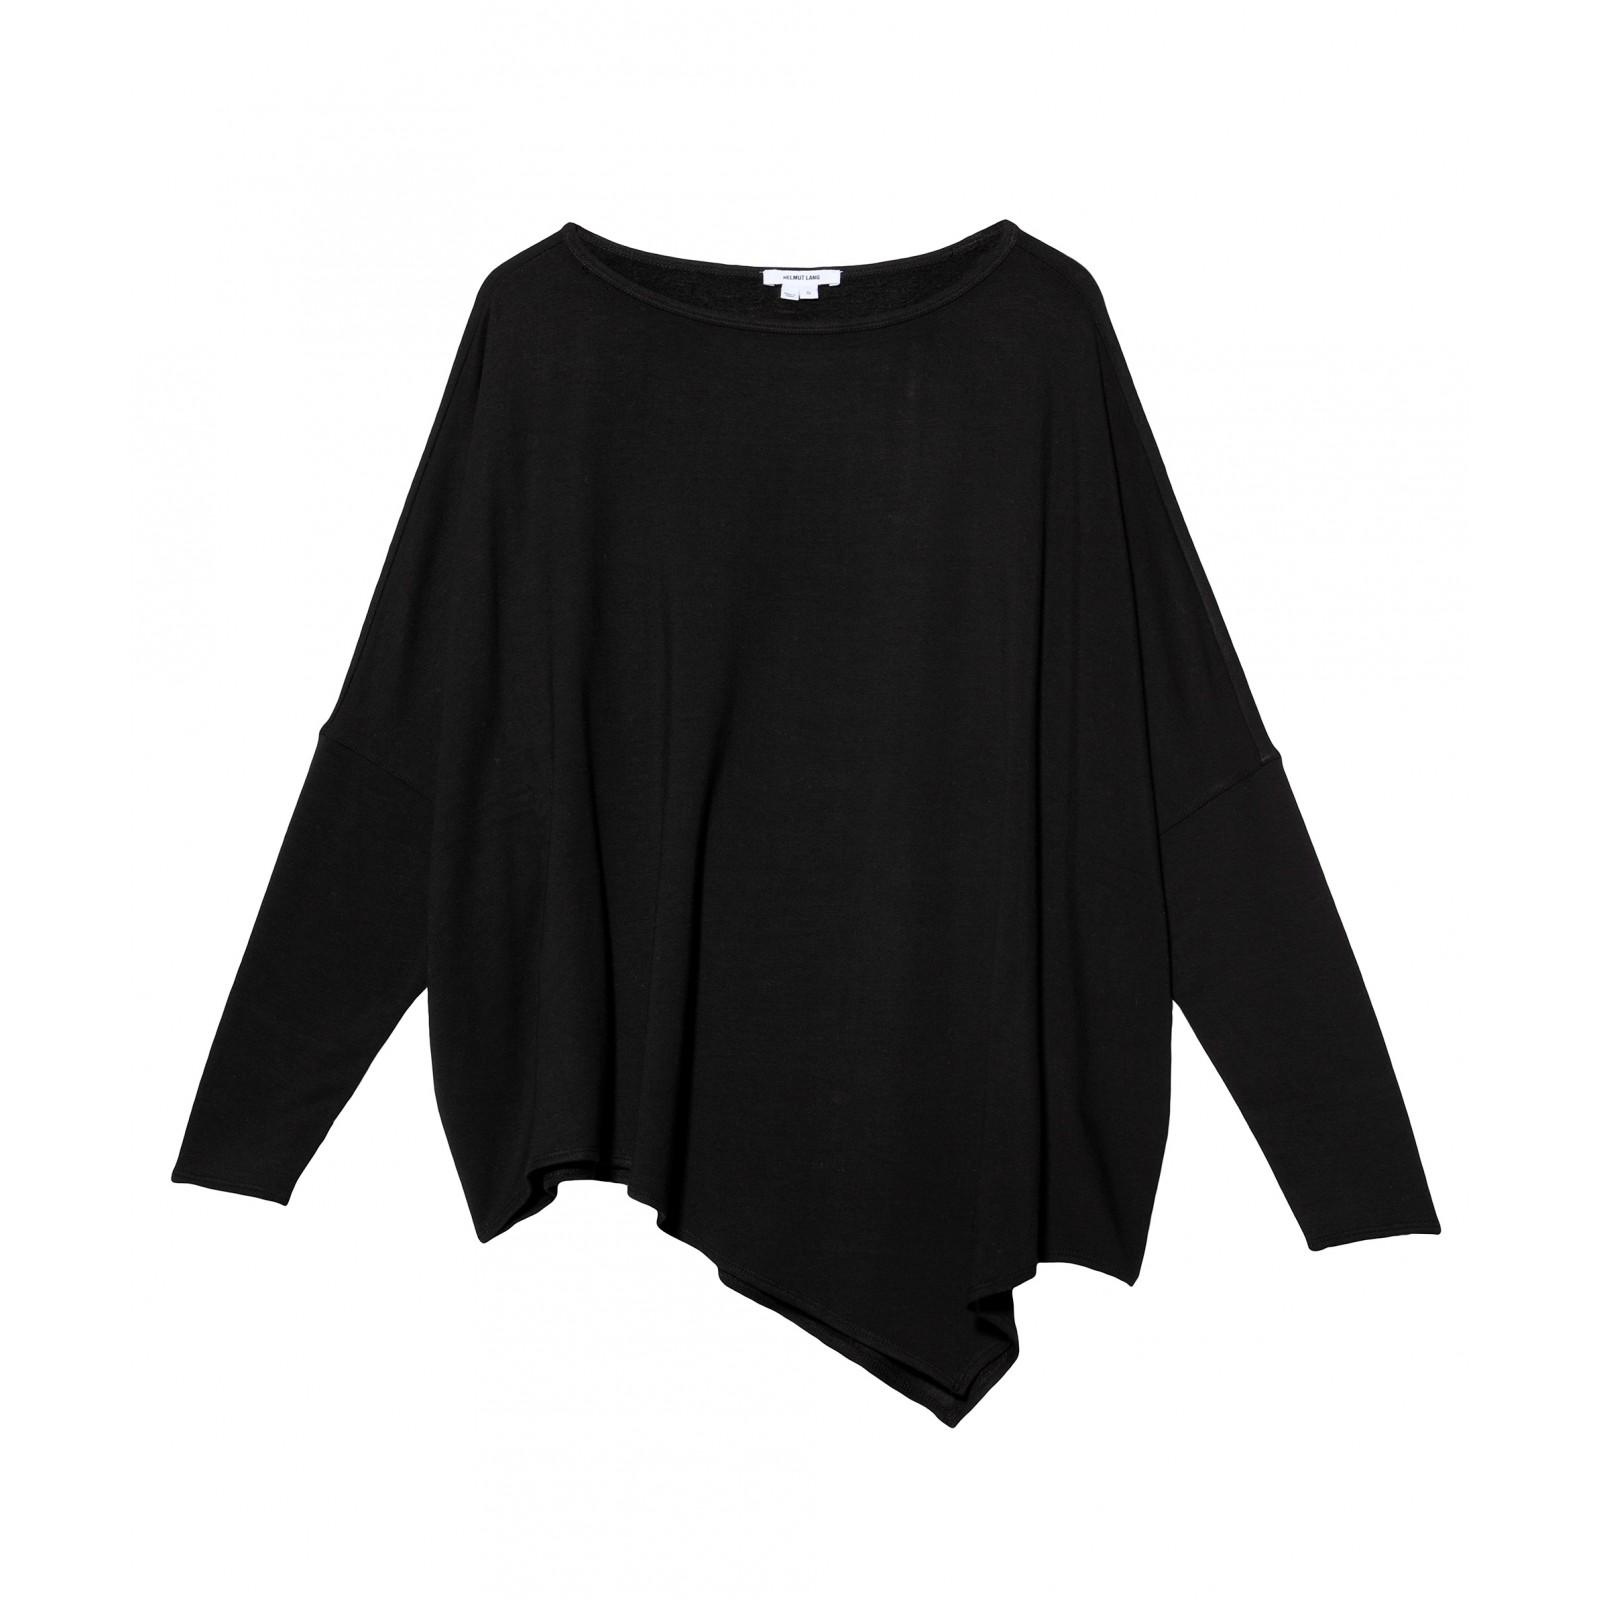 Villous pullover